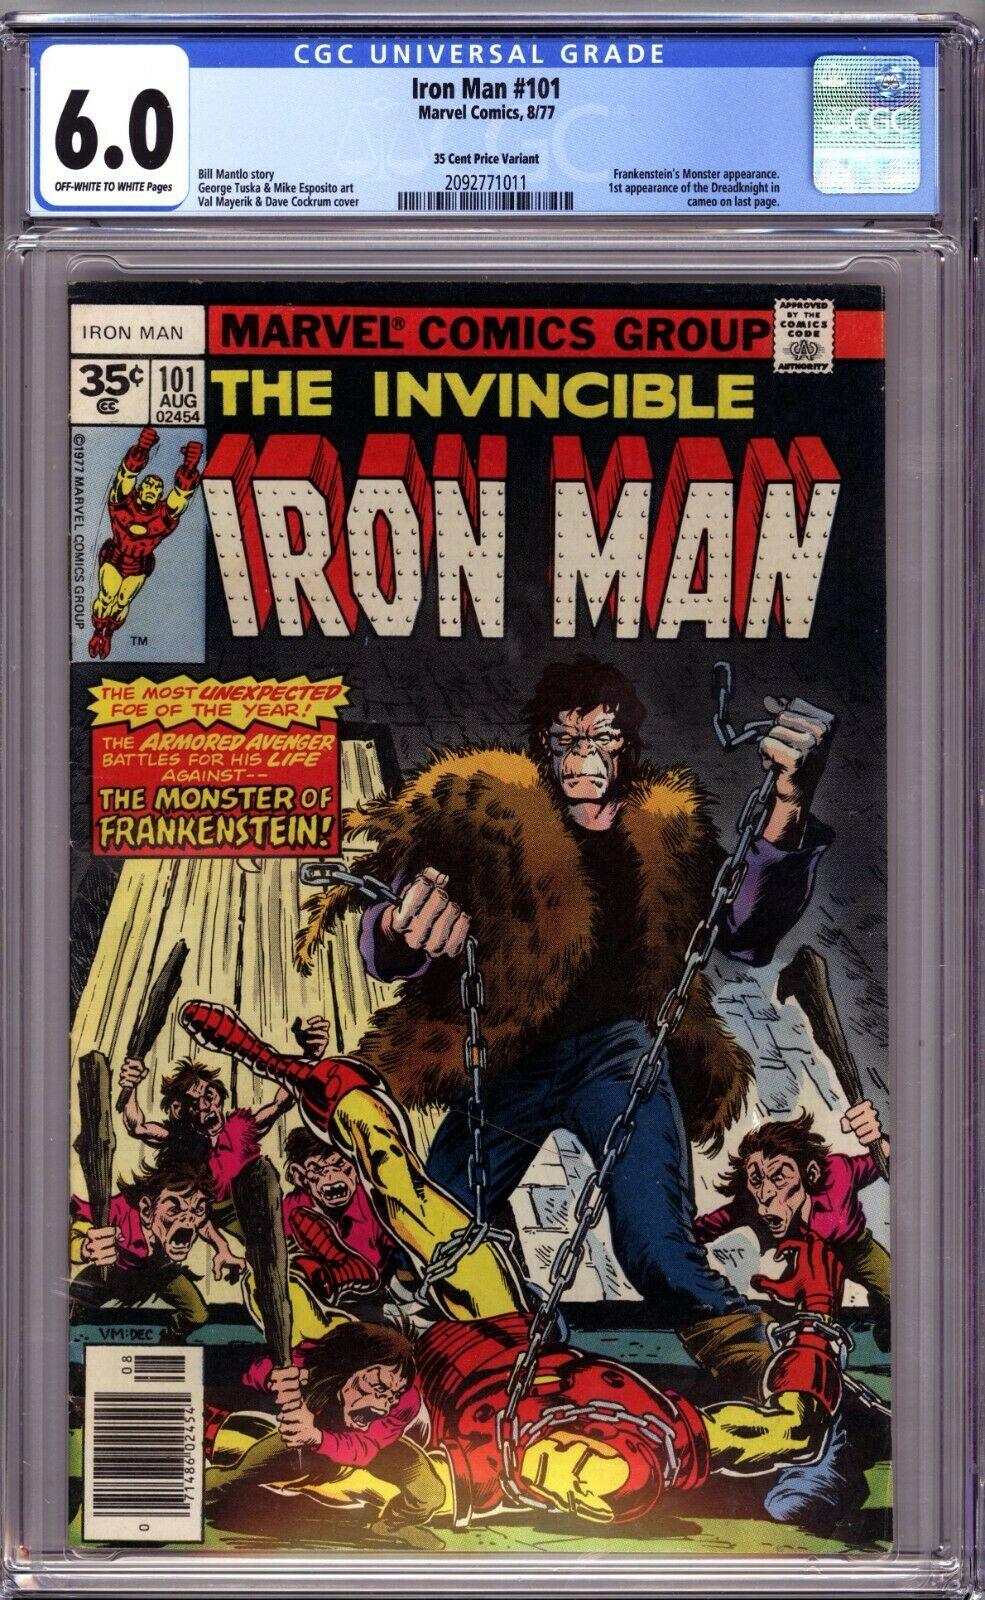 IRON MAN #101 RARE 35 CENT COVER PRICE VARIANT CGC 6.0 FINE MARVEL 1977 NO RSRVE